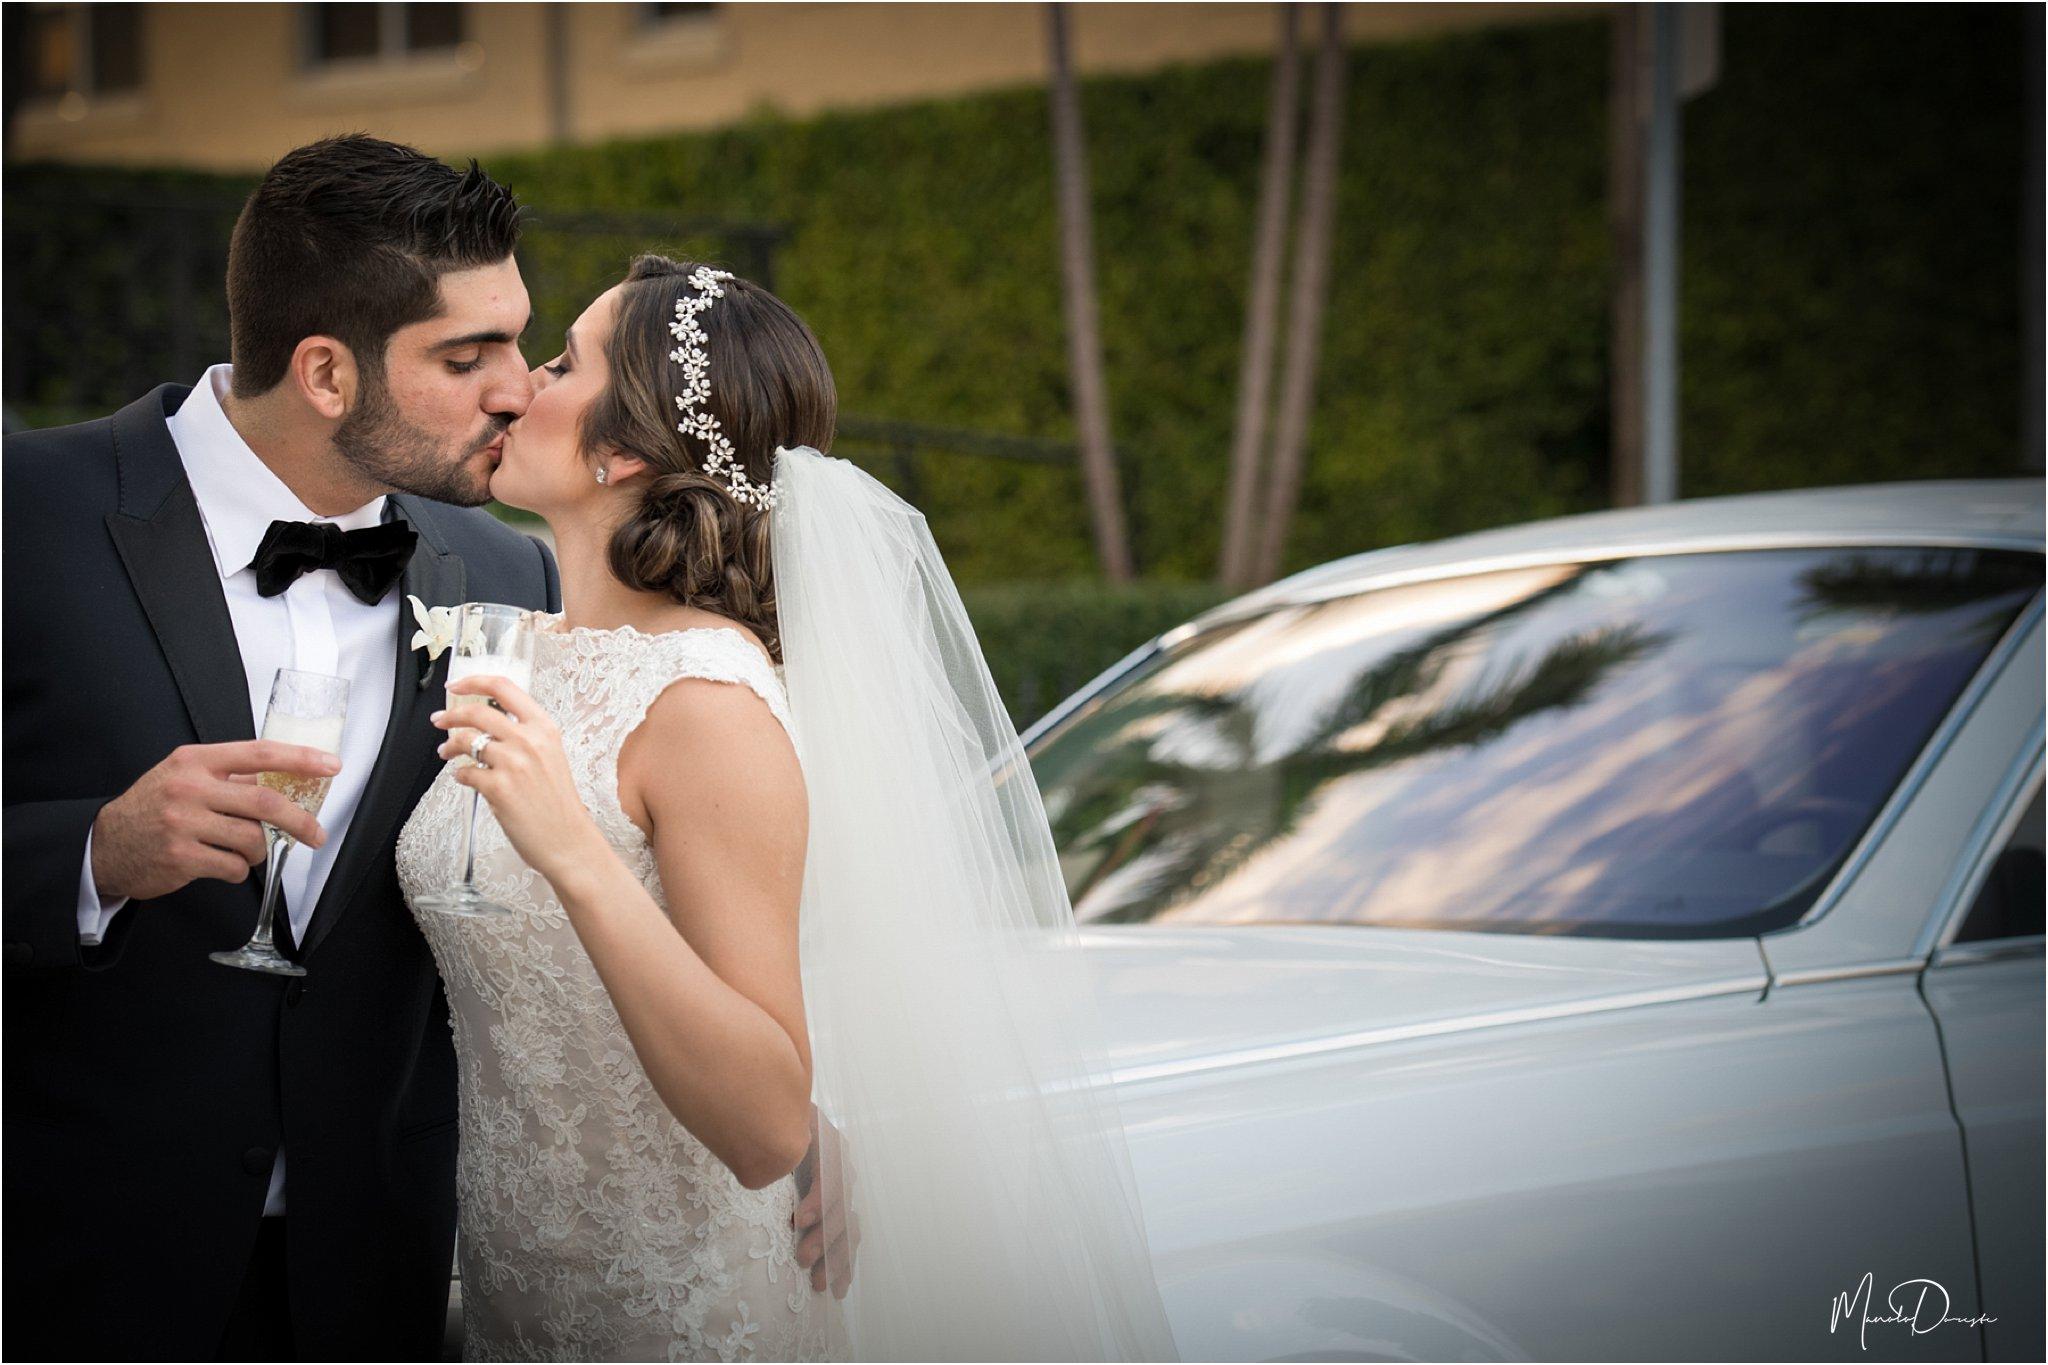 00941_ManoloDoreste_InFocusStudios_Wedding_Family_Photography_Miami_MiamiPhotographer.jpg